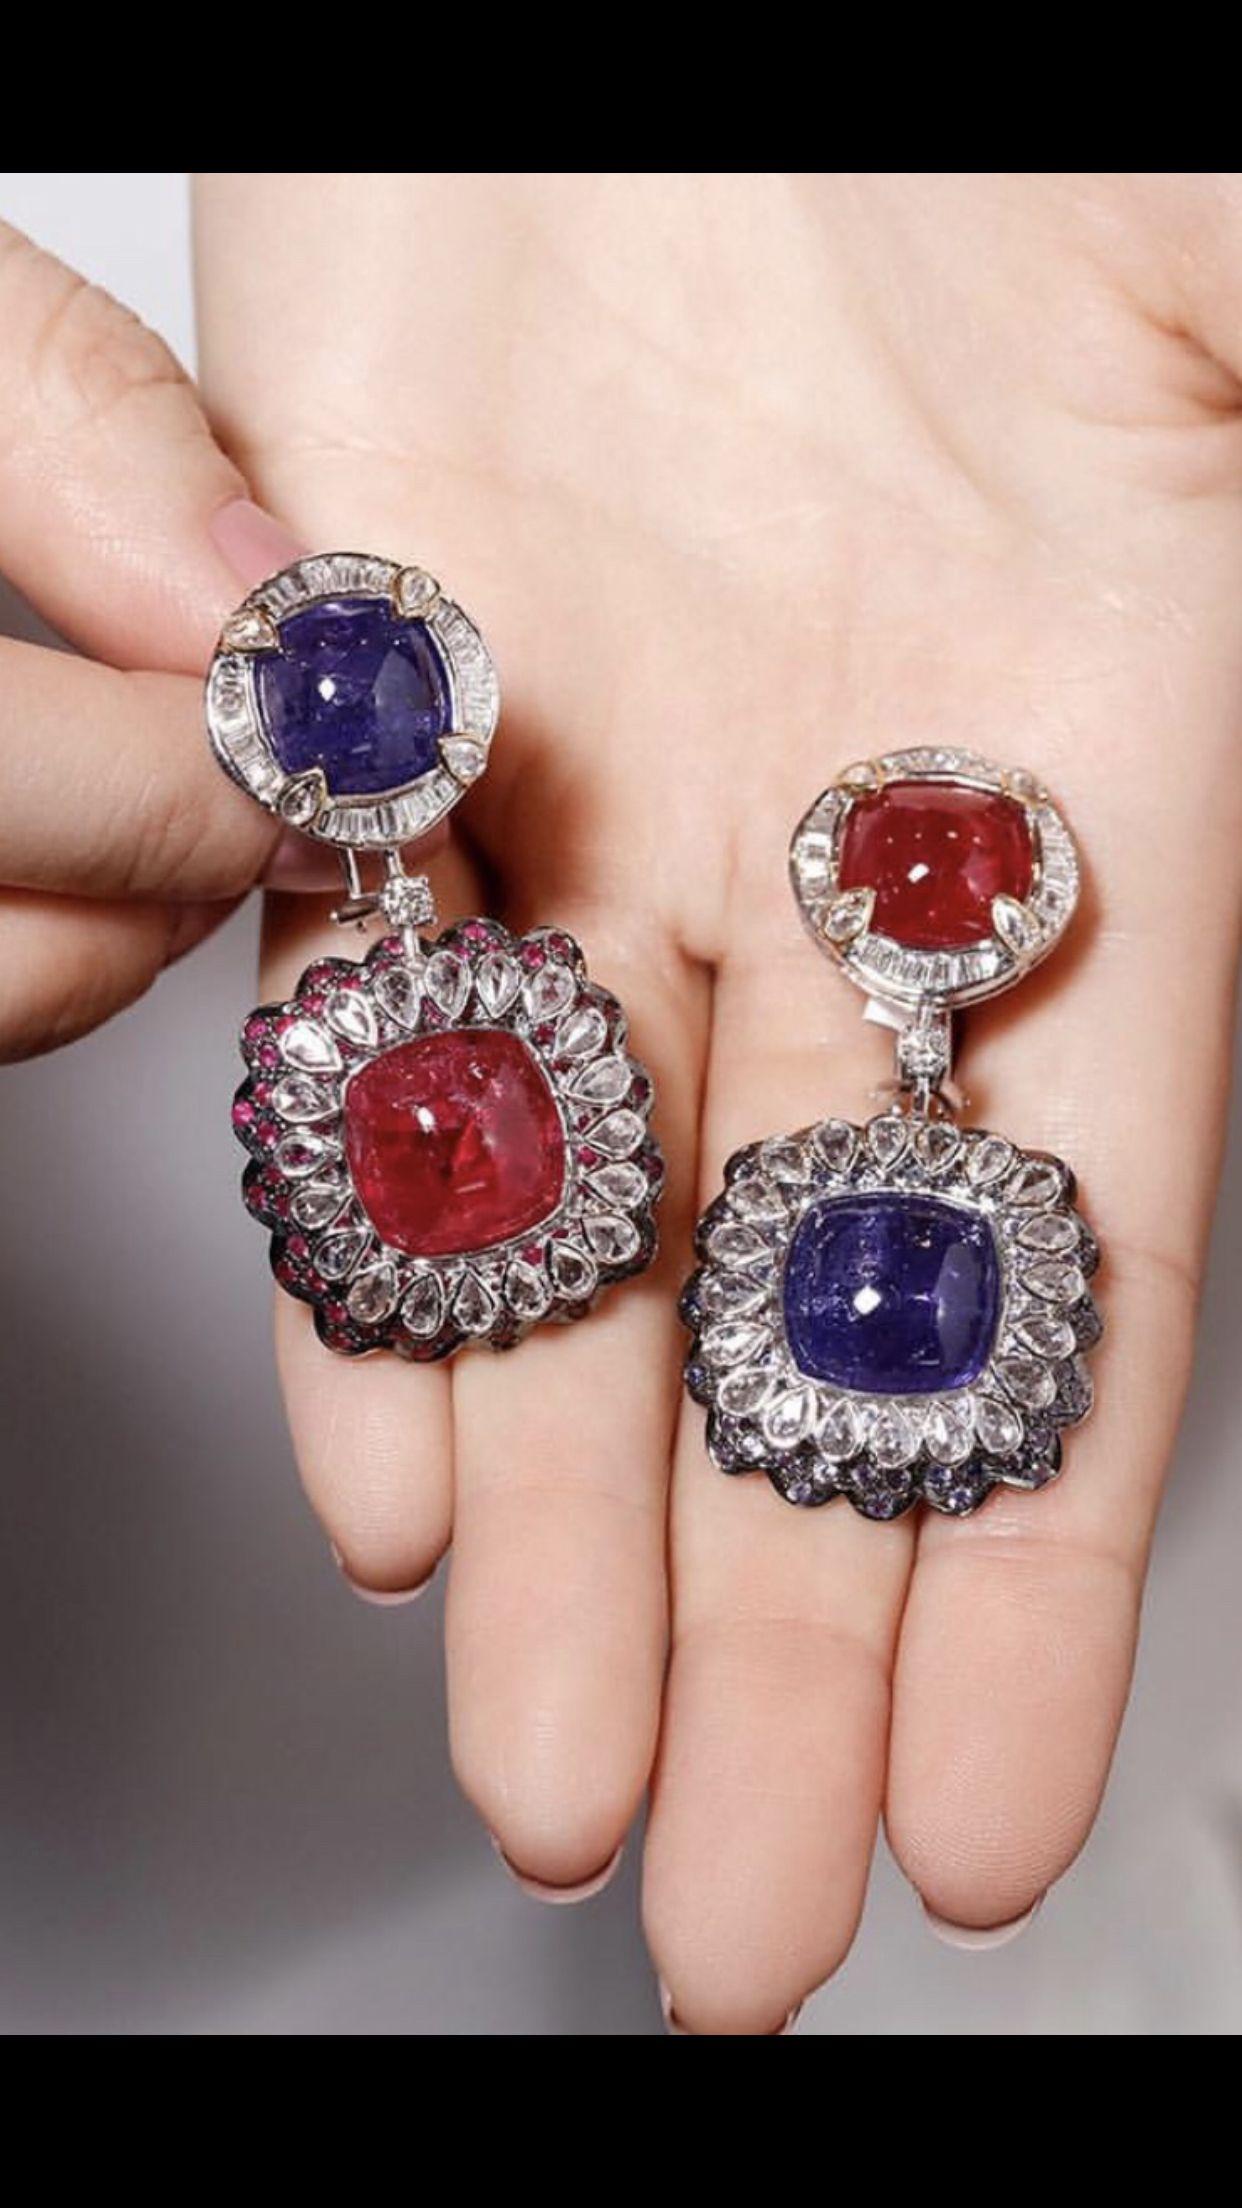 Pin by Vicki Wilson on JewelryEarrings Jewelry, Pink